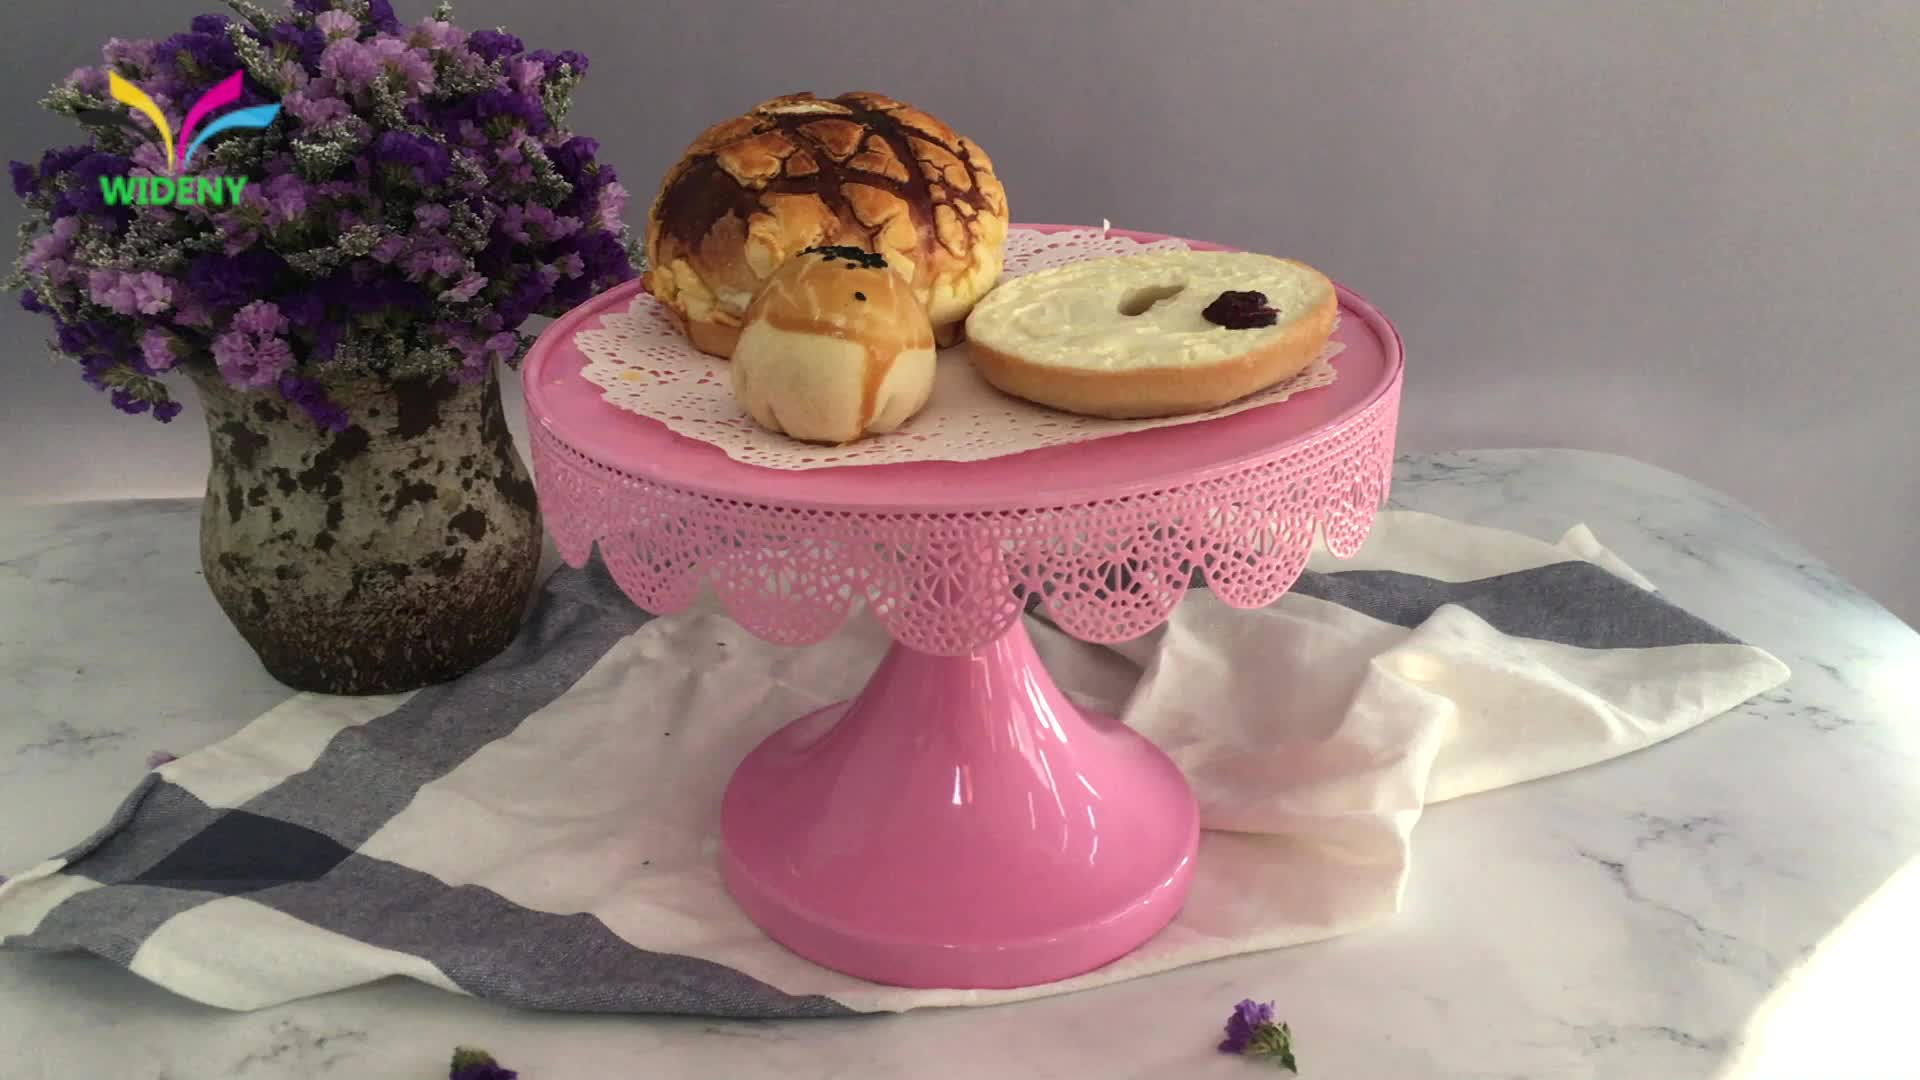 Logam Tanaman Besi 2 Tingkat Dilapisi Bubuk Makanan Penutup Buah Pernikahan Cupcake Kue Rak Buy Rak Kuekue Pengantin Raklogam Kue Rak Product On